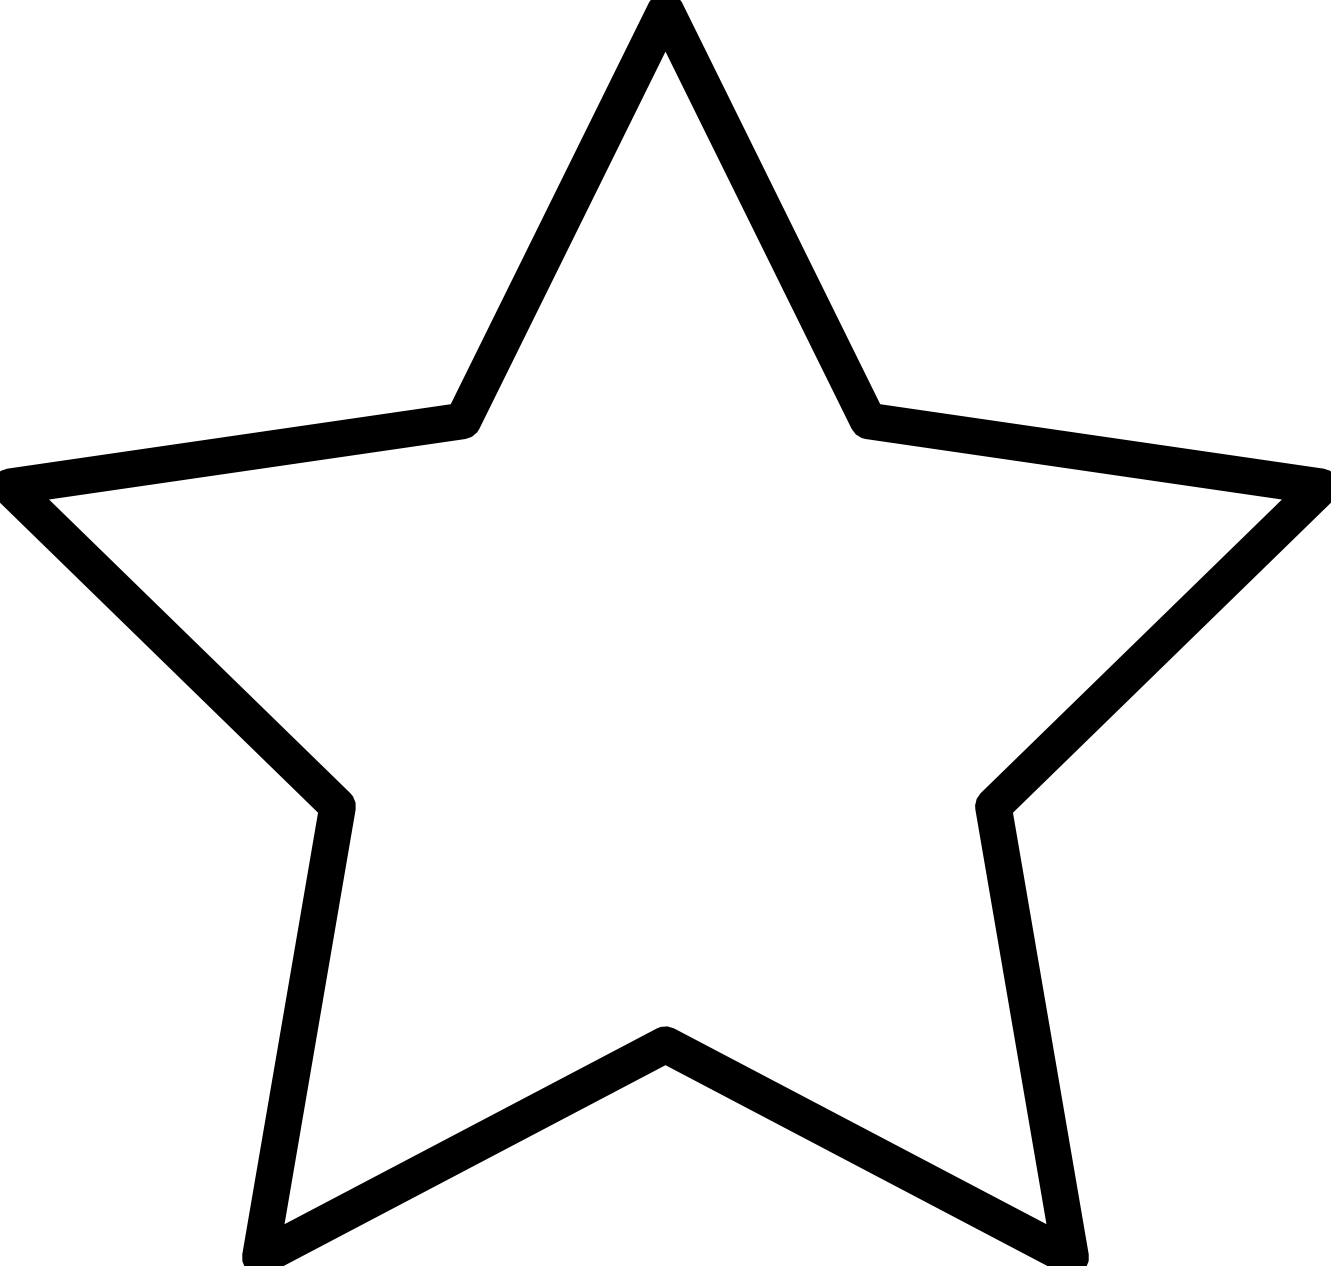 1331x1266 Star Clip Art Black And White Clipart Panda